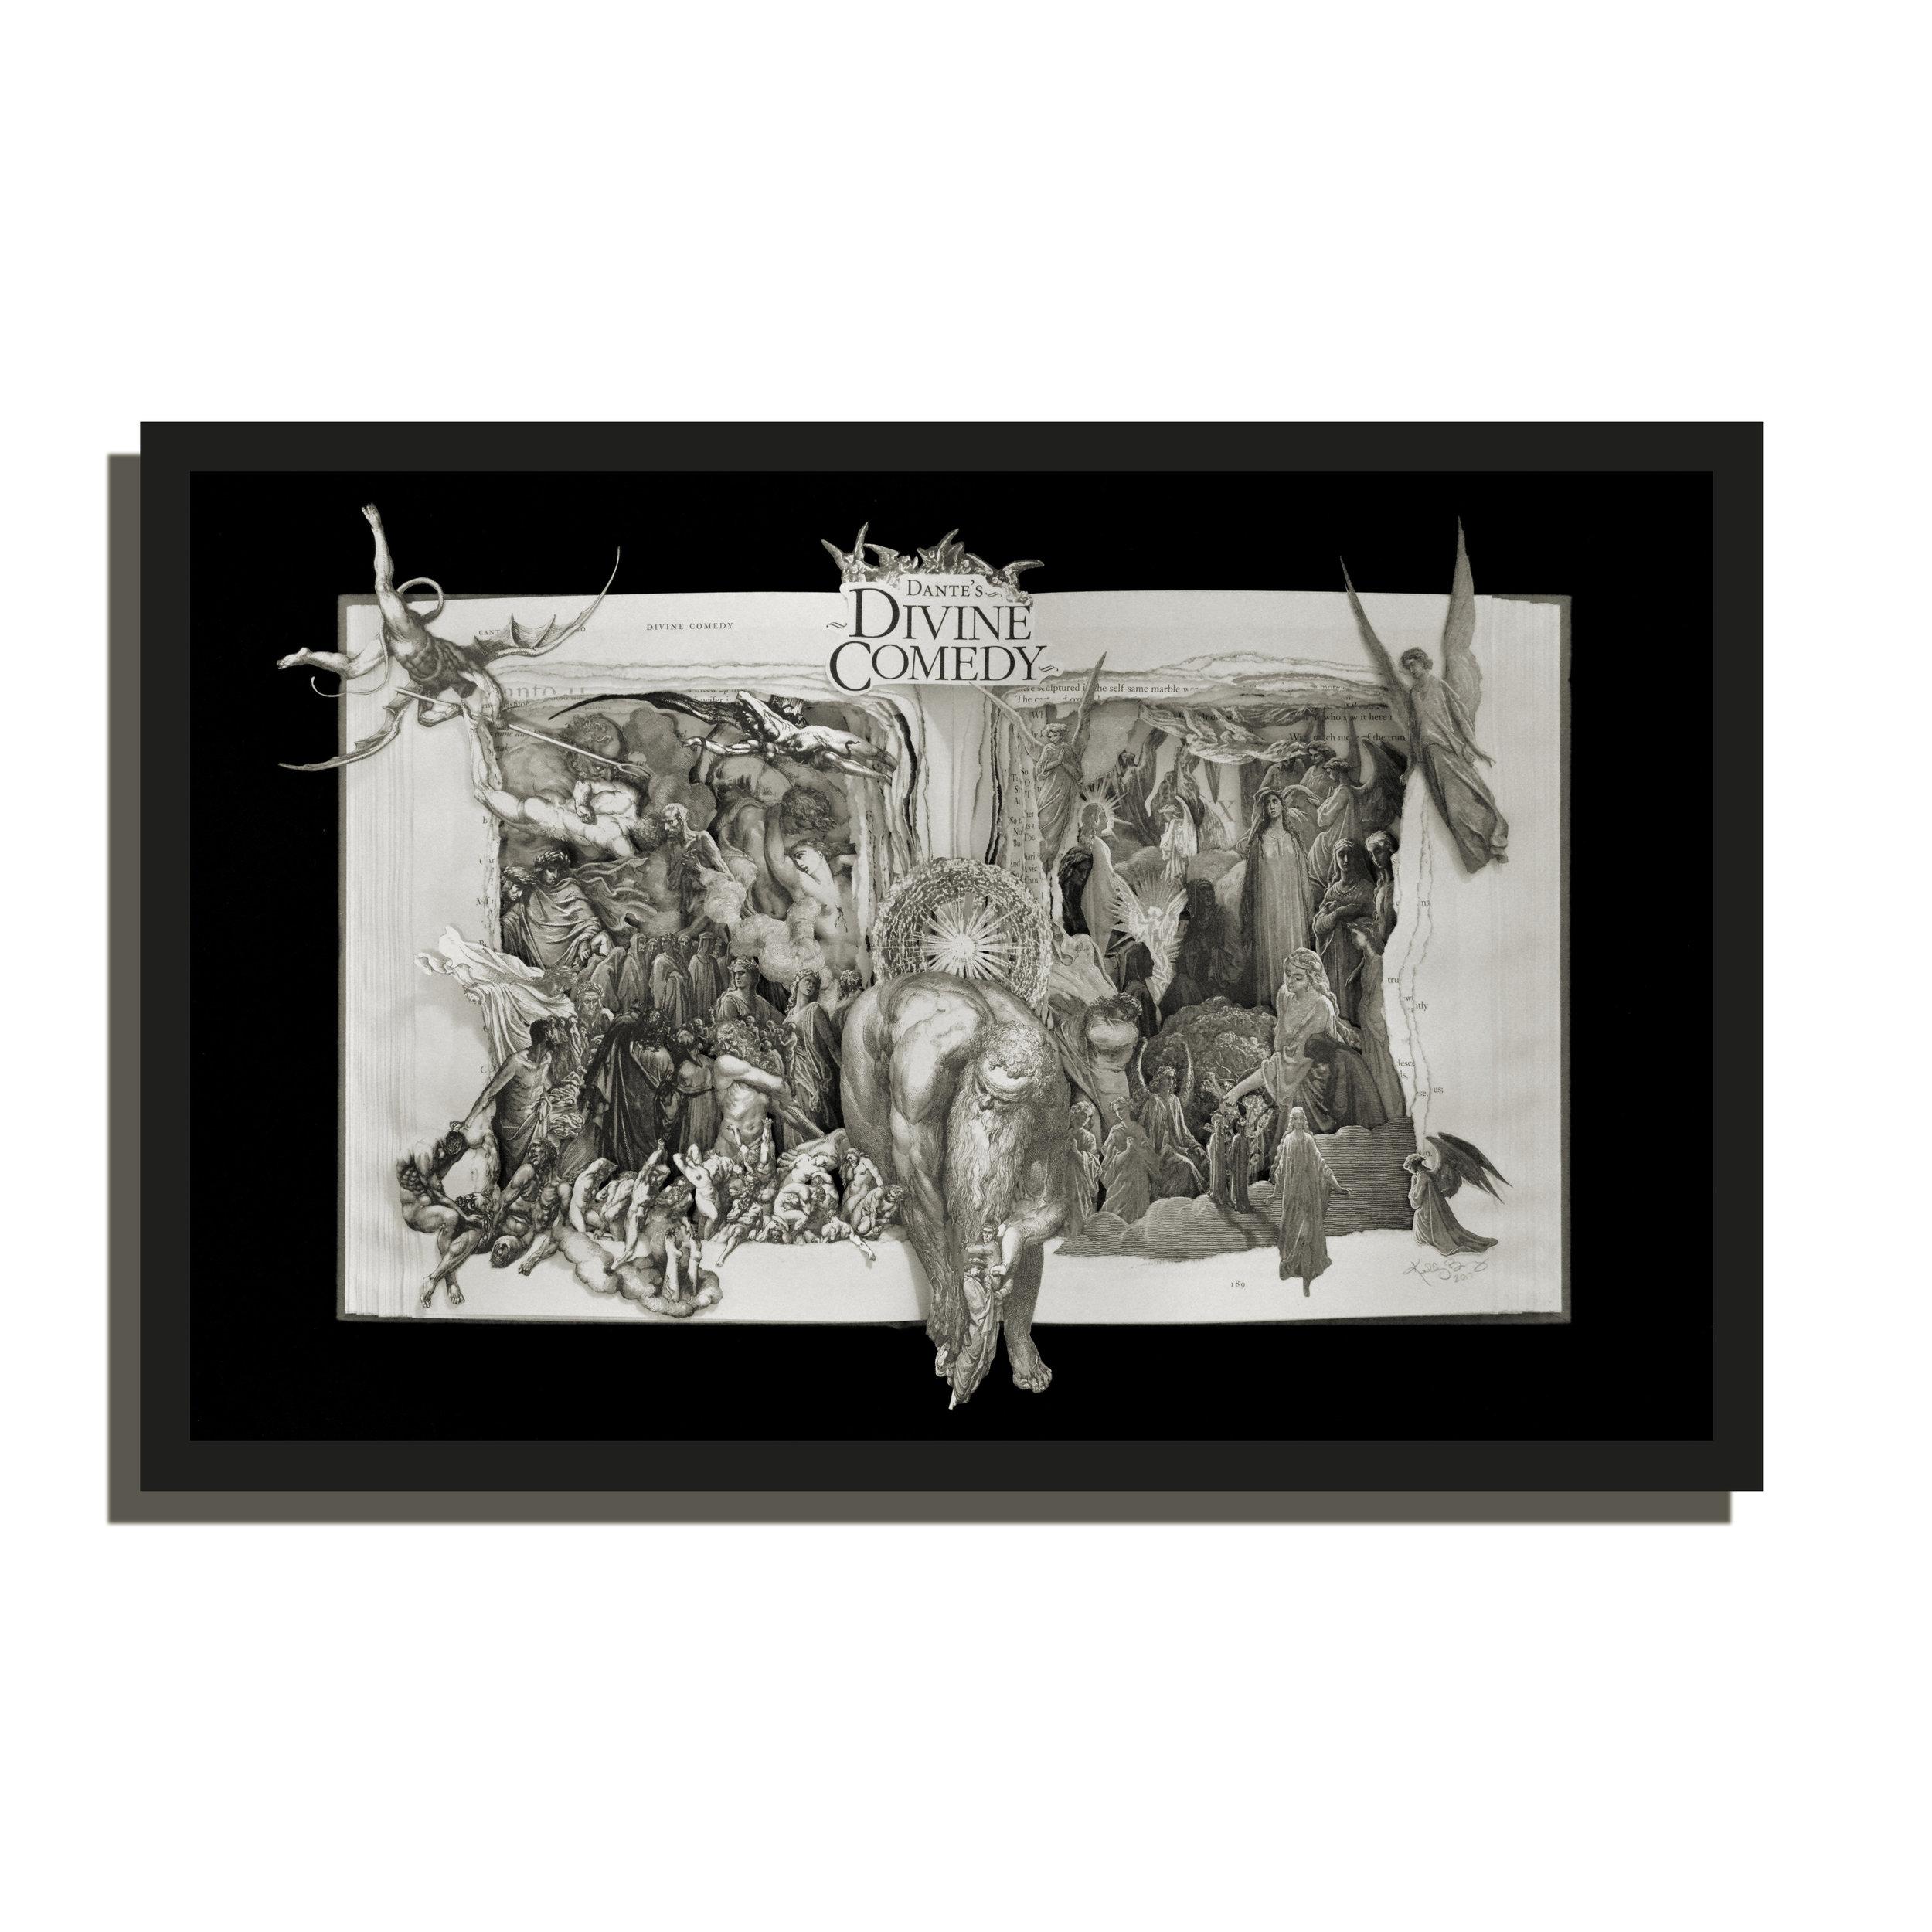 Dante's Divine Comedy - 16x20x3 - This was a Custom Order